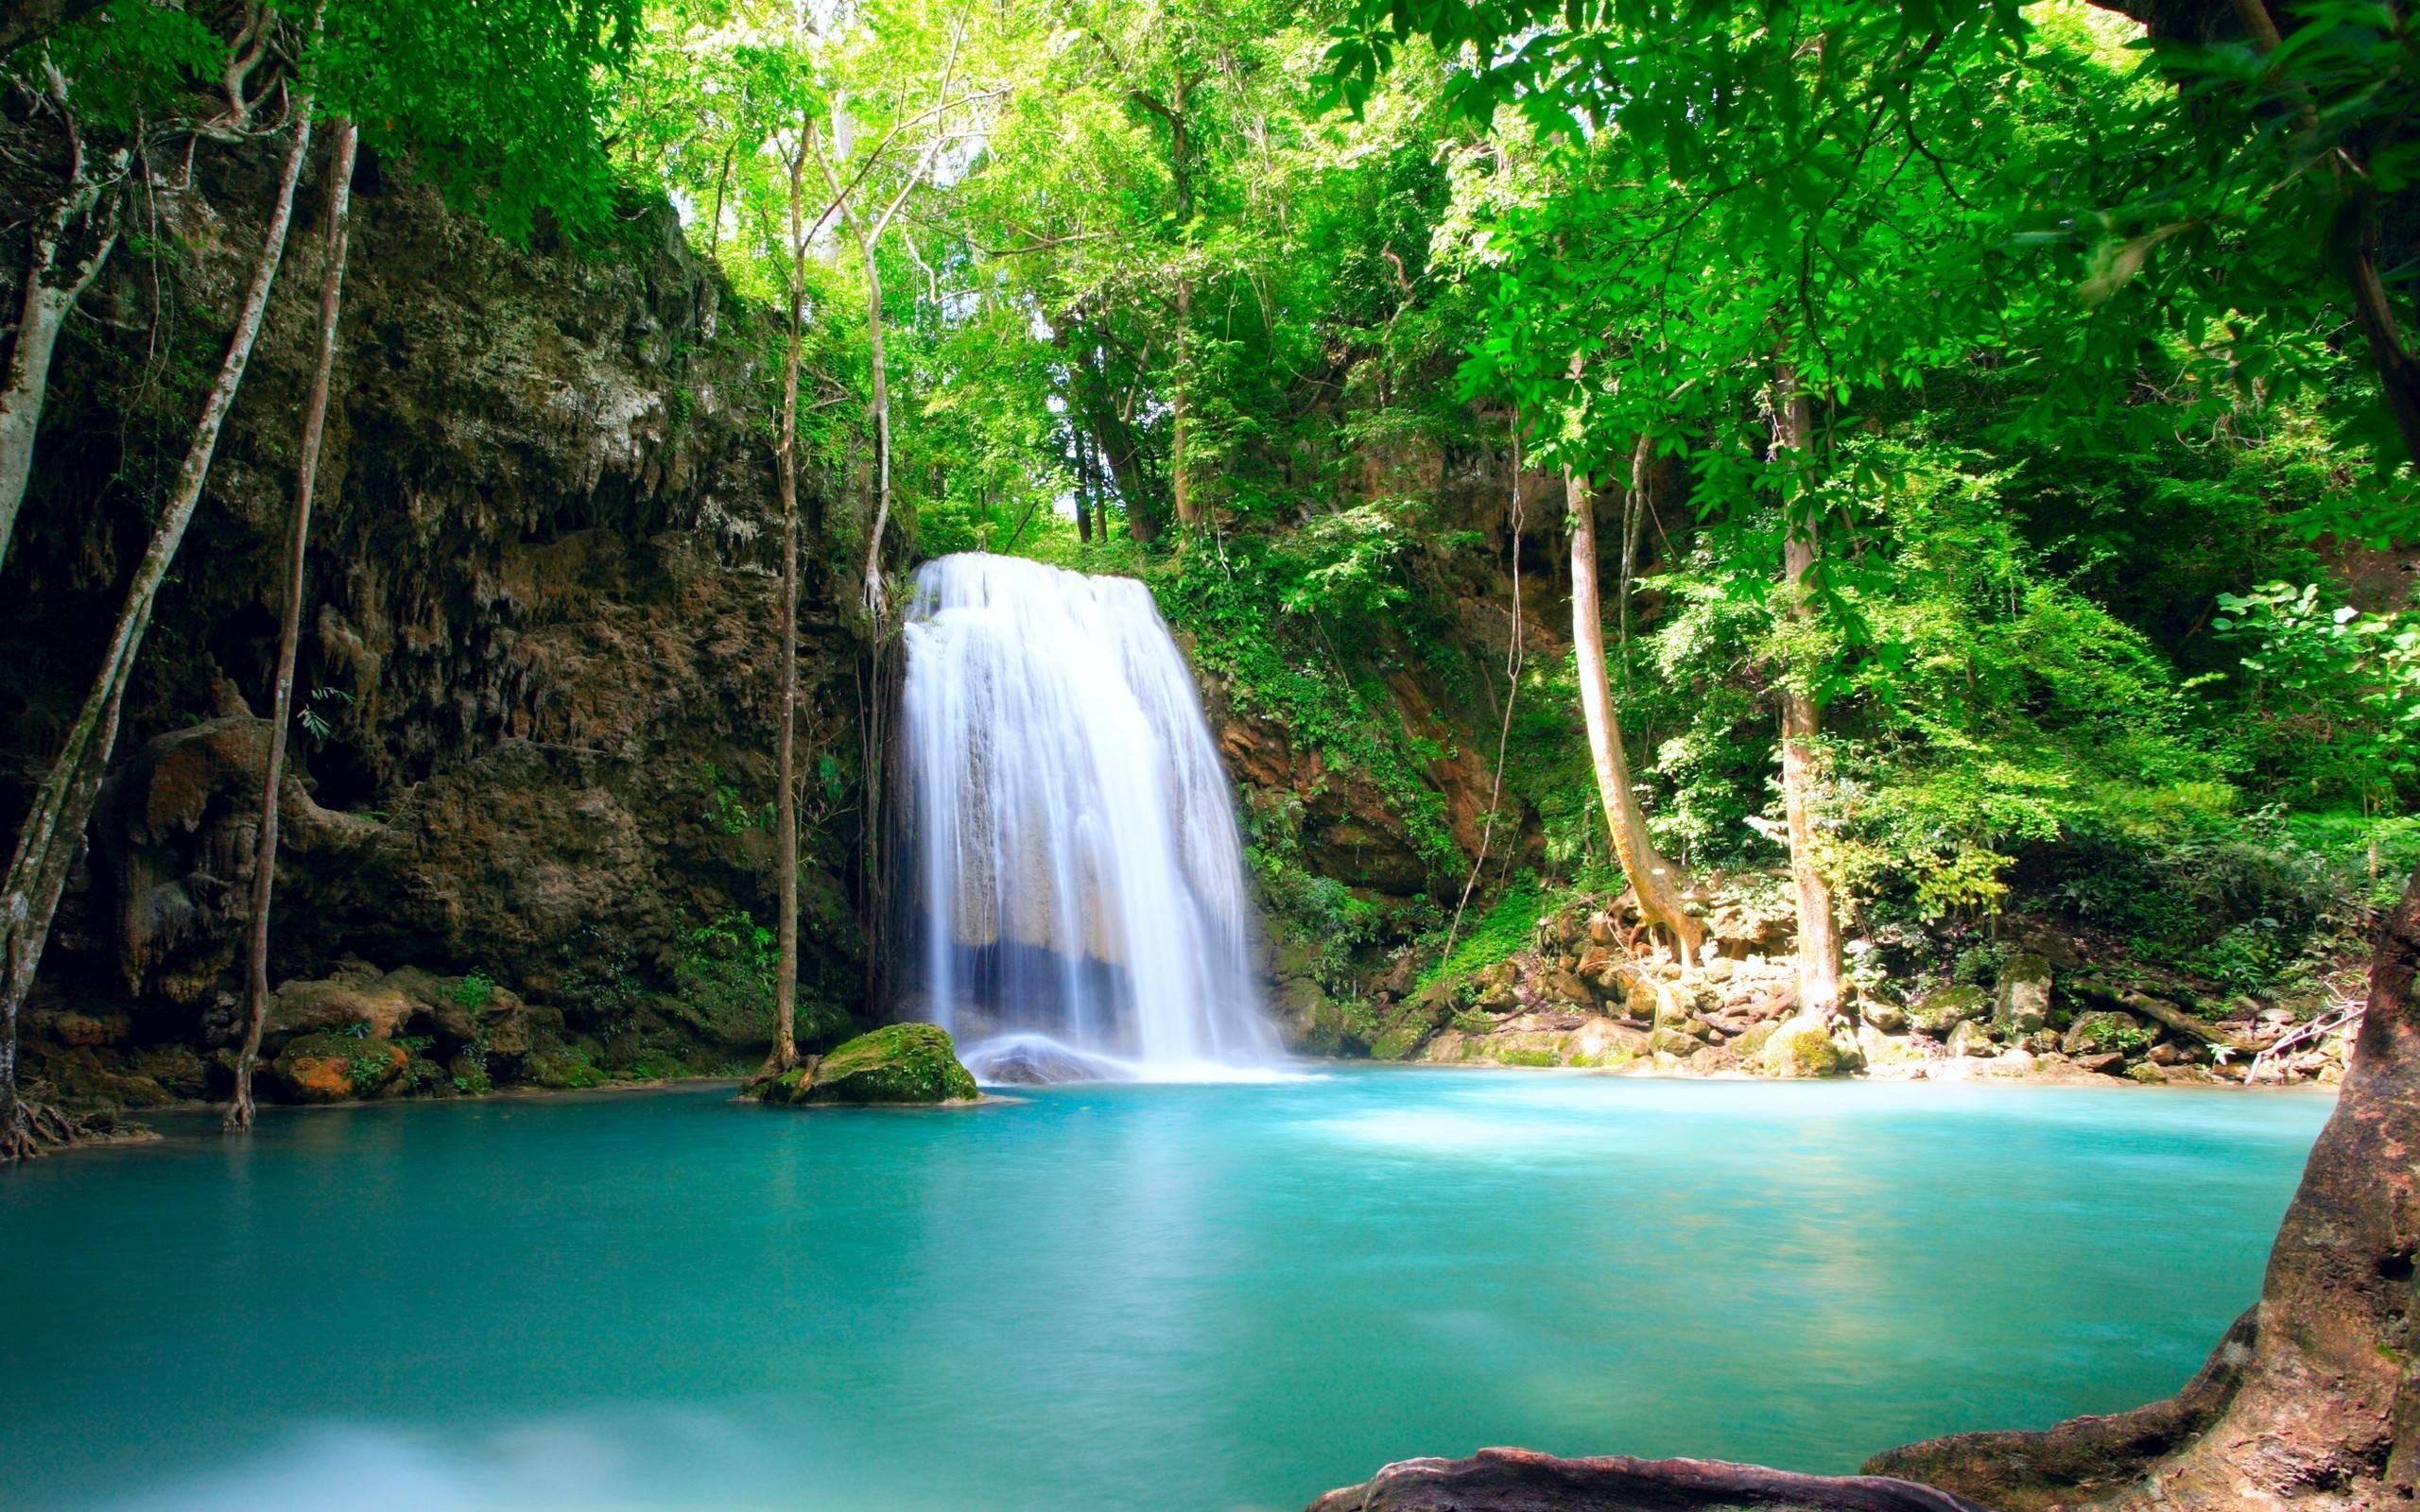 Beautiful-Tropical-Rainforest-Wallpaper-3 – HD wallpapers